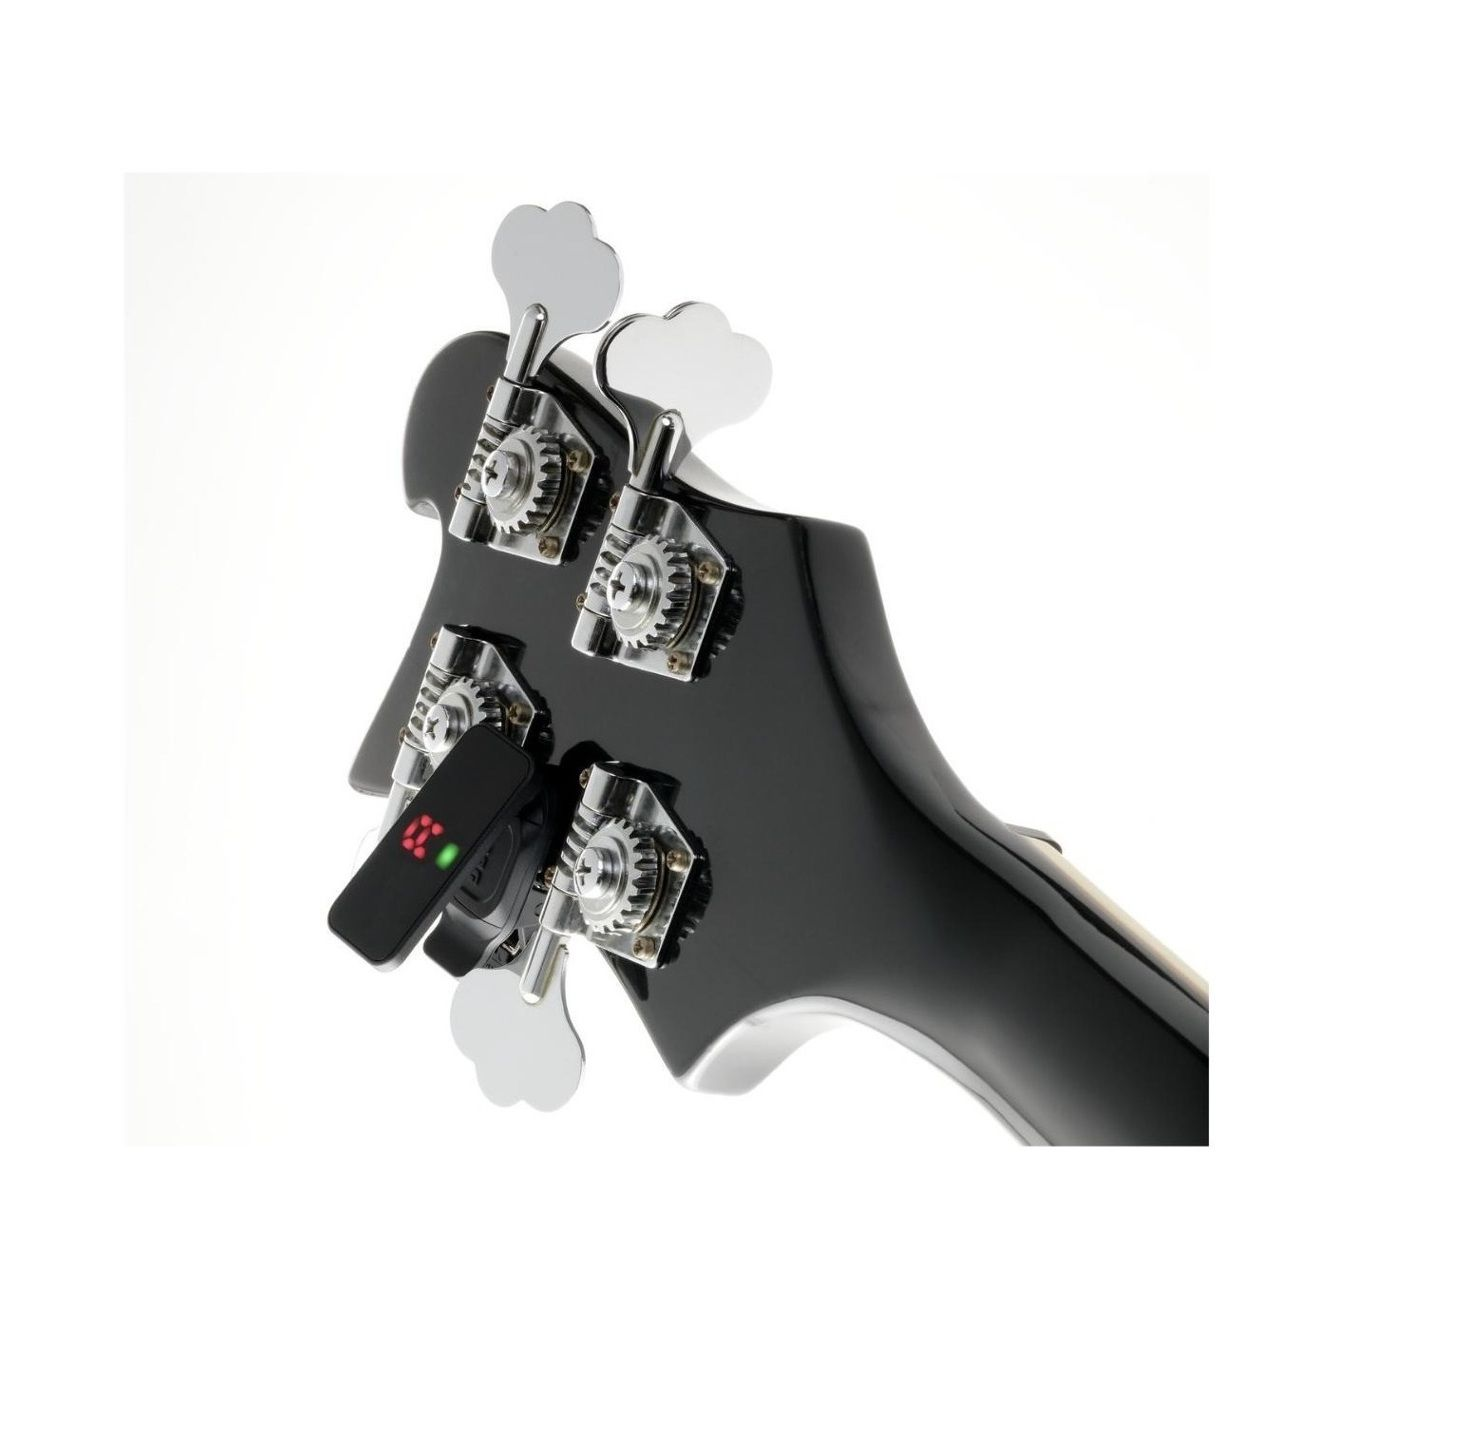 Afinador Cromático Korg Pitchclip PC-2 Bk